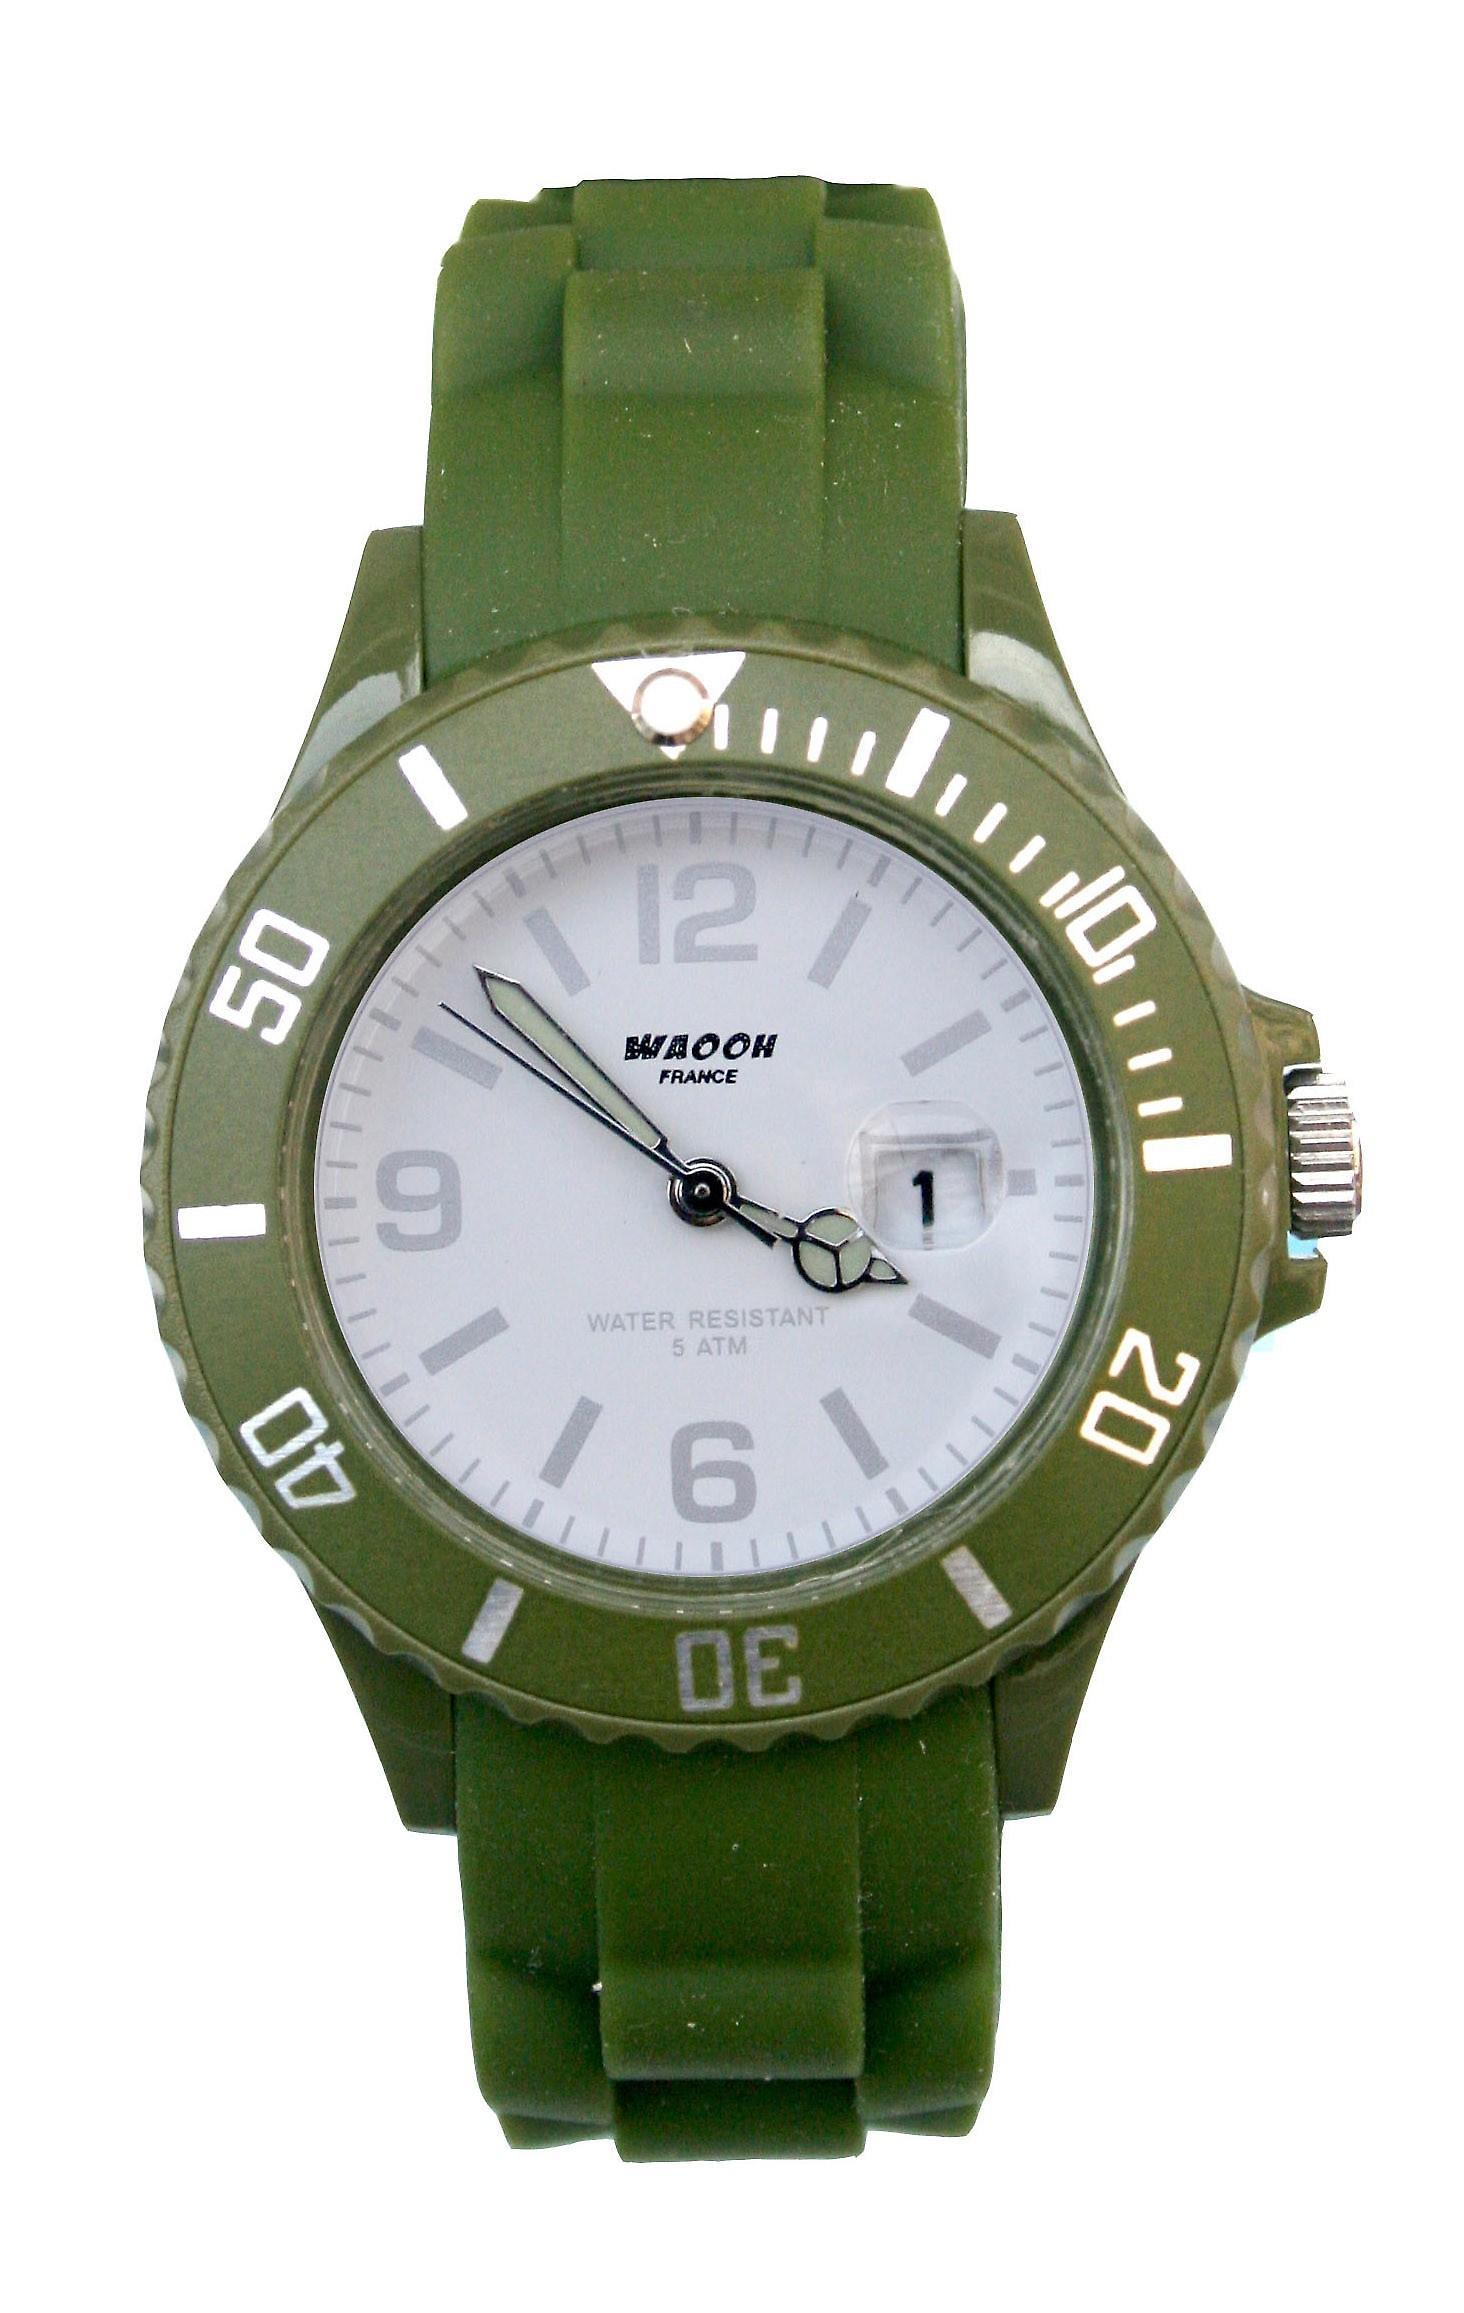 Waooh - Watches - Ice Waooh Monaco 38 Strap Colour